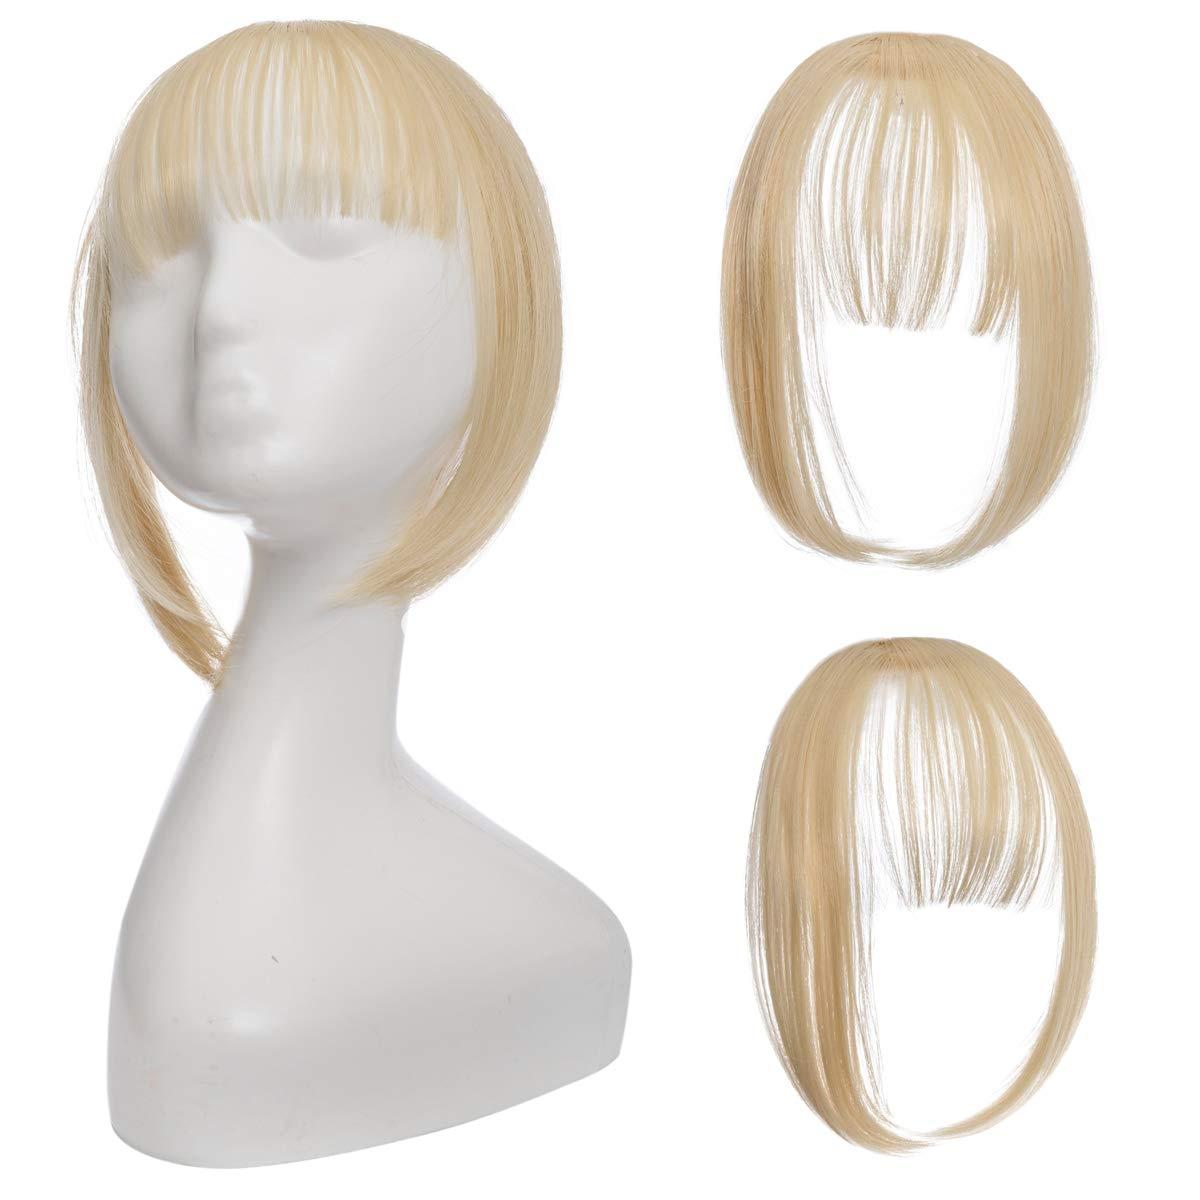 Shangzi Clip In Blunt Bangs Bang Hair Extension Synthetic Wig Fake Fringe Natural Hair Bangs Black L Brown Accessories Fake Hair